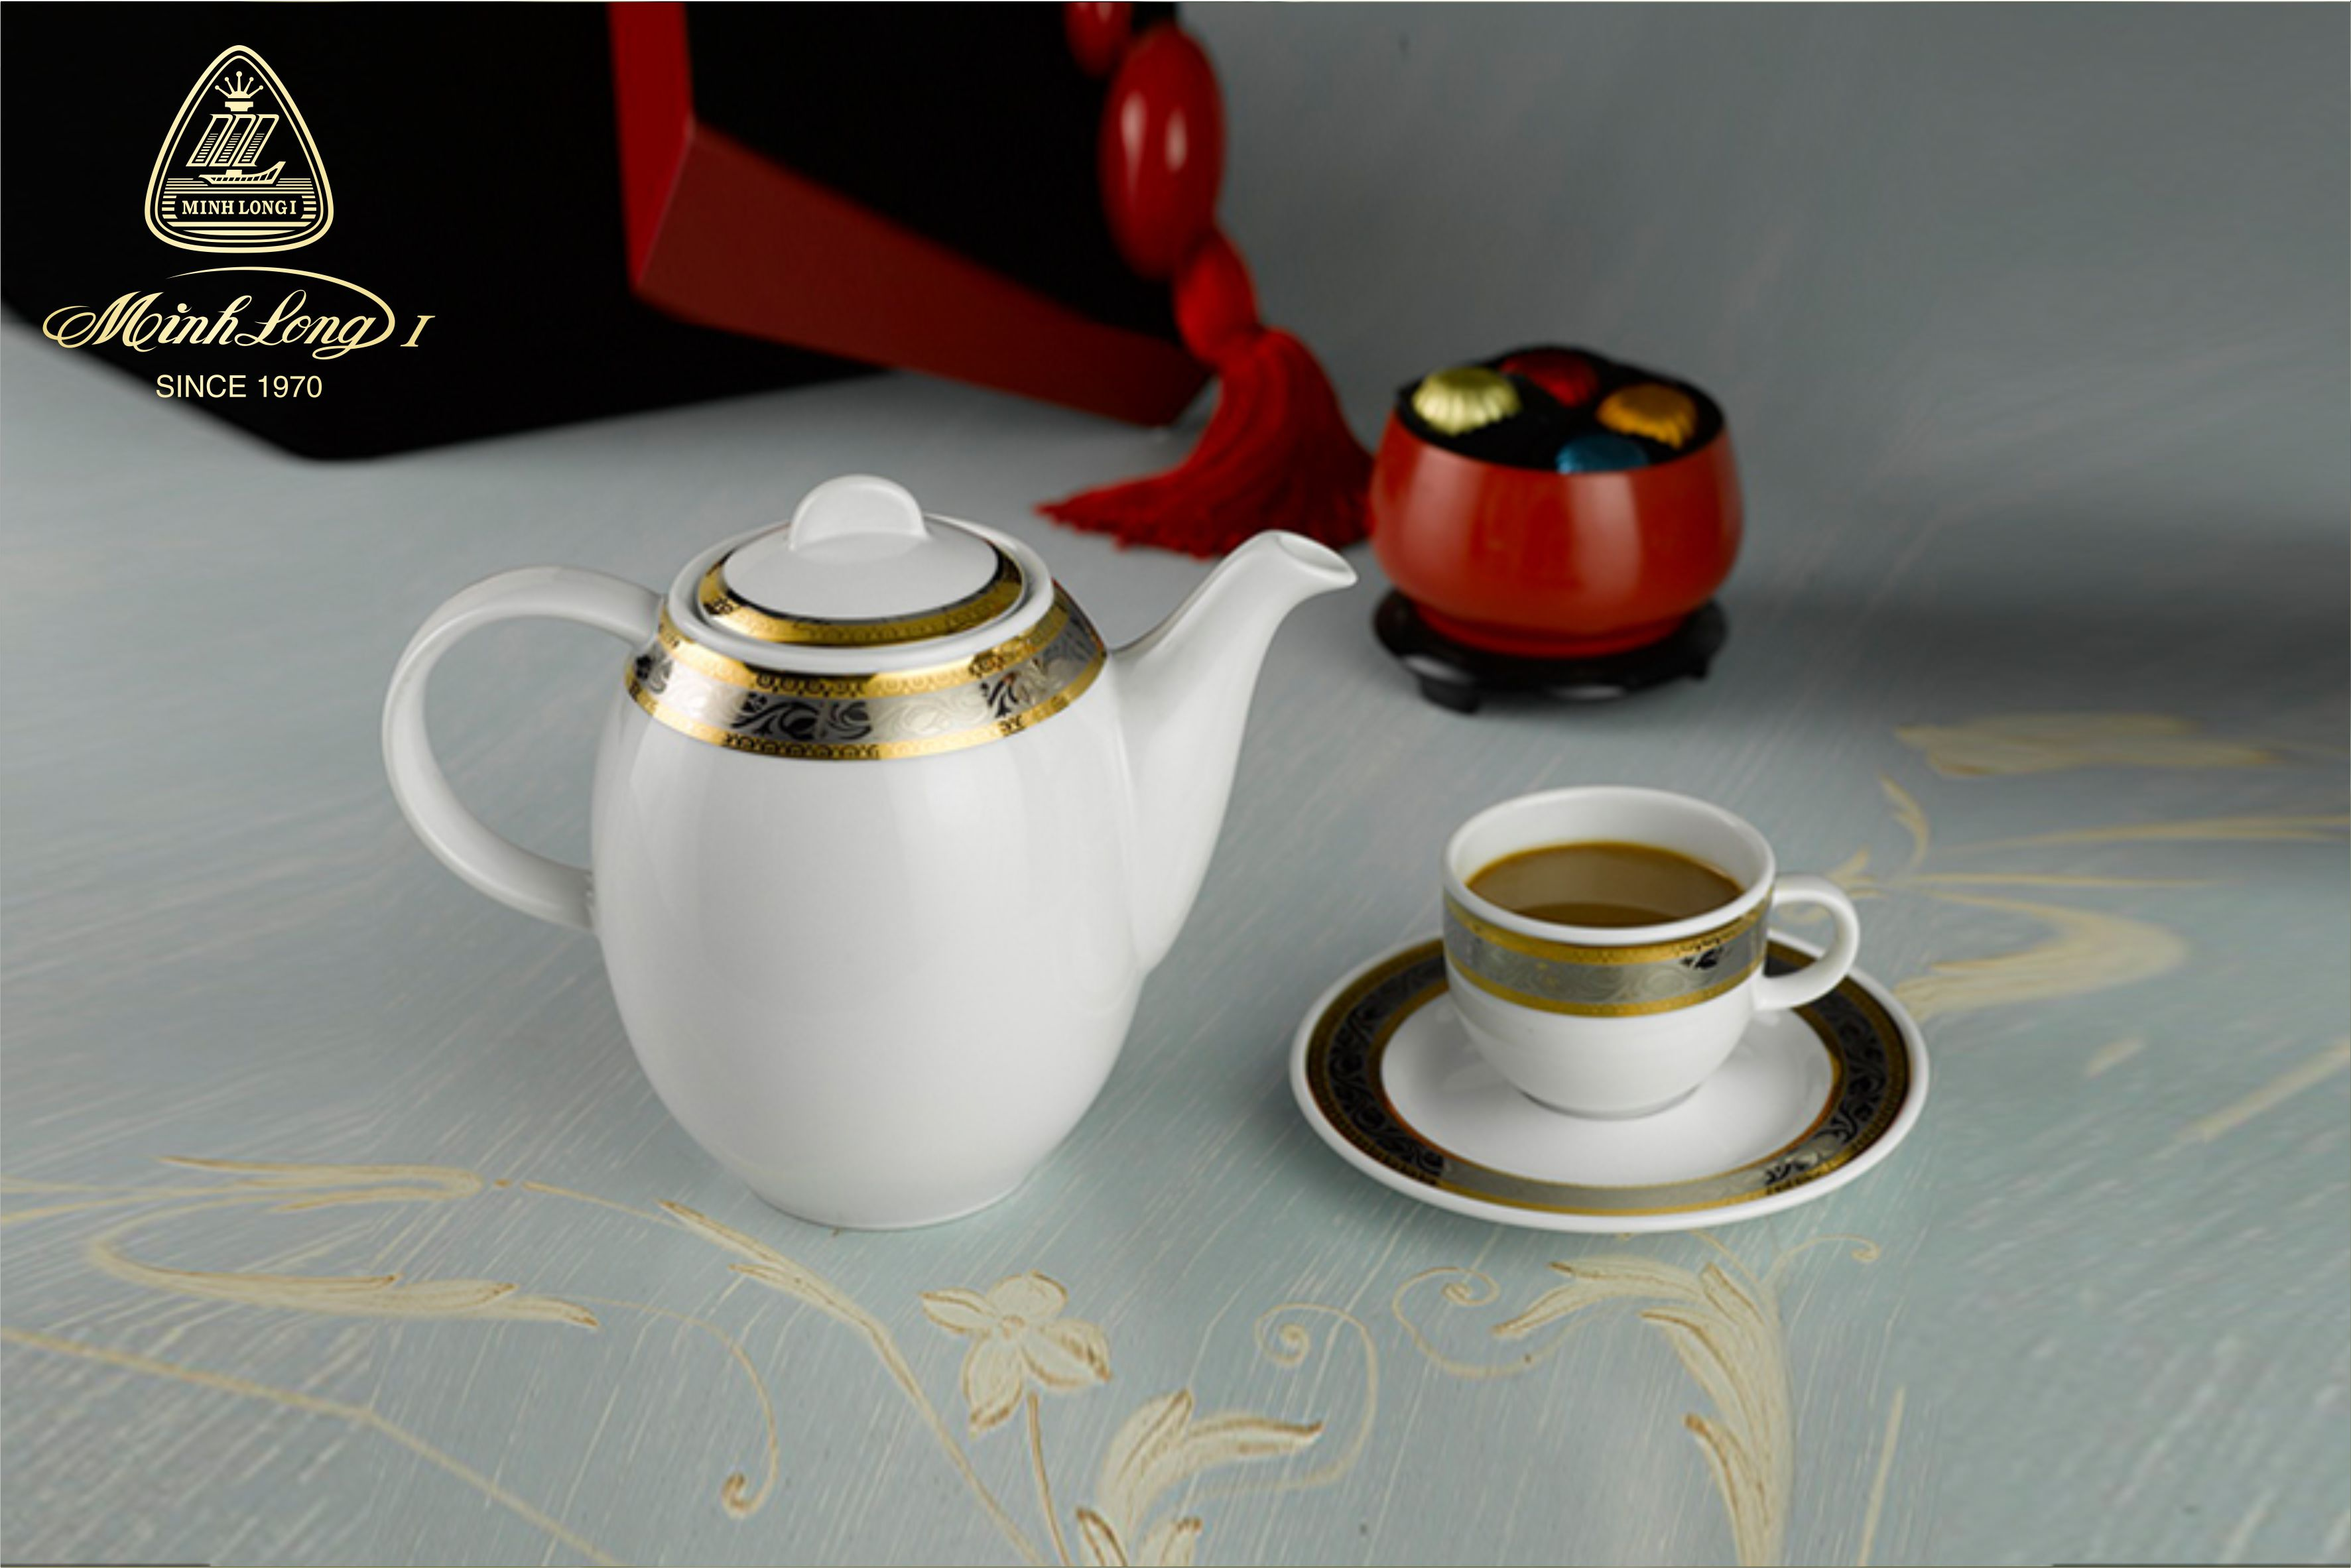 Bộ cà phê 0.8L Sago Hoa Hồng 01080101703 Minh Long